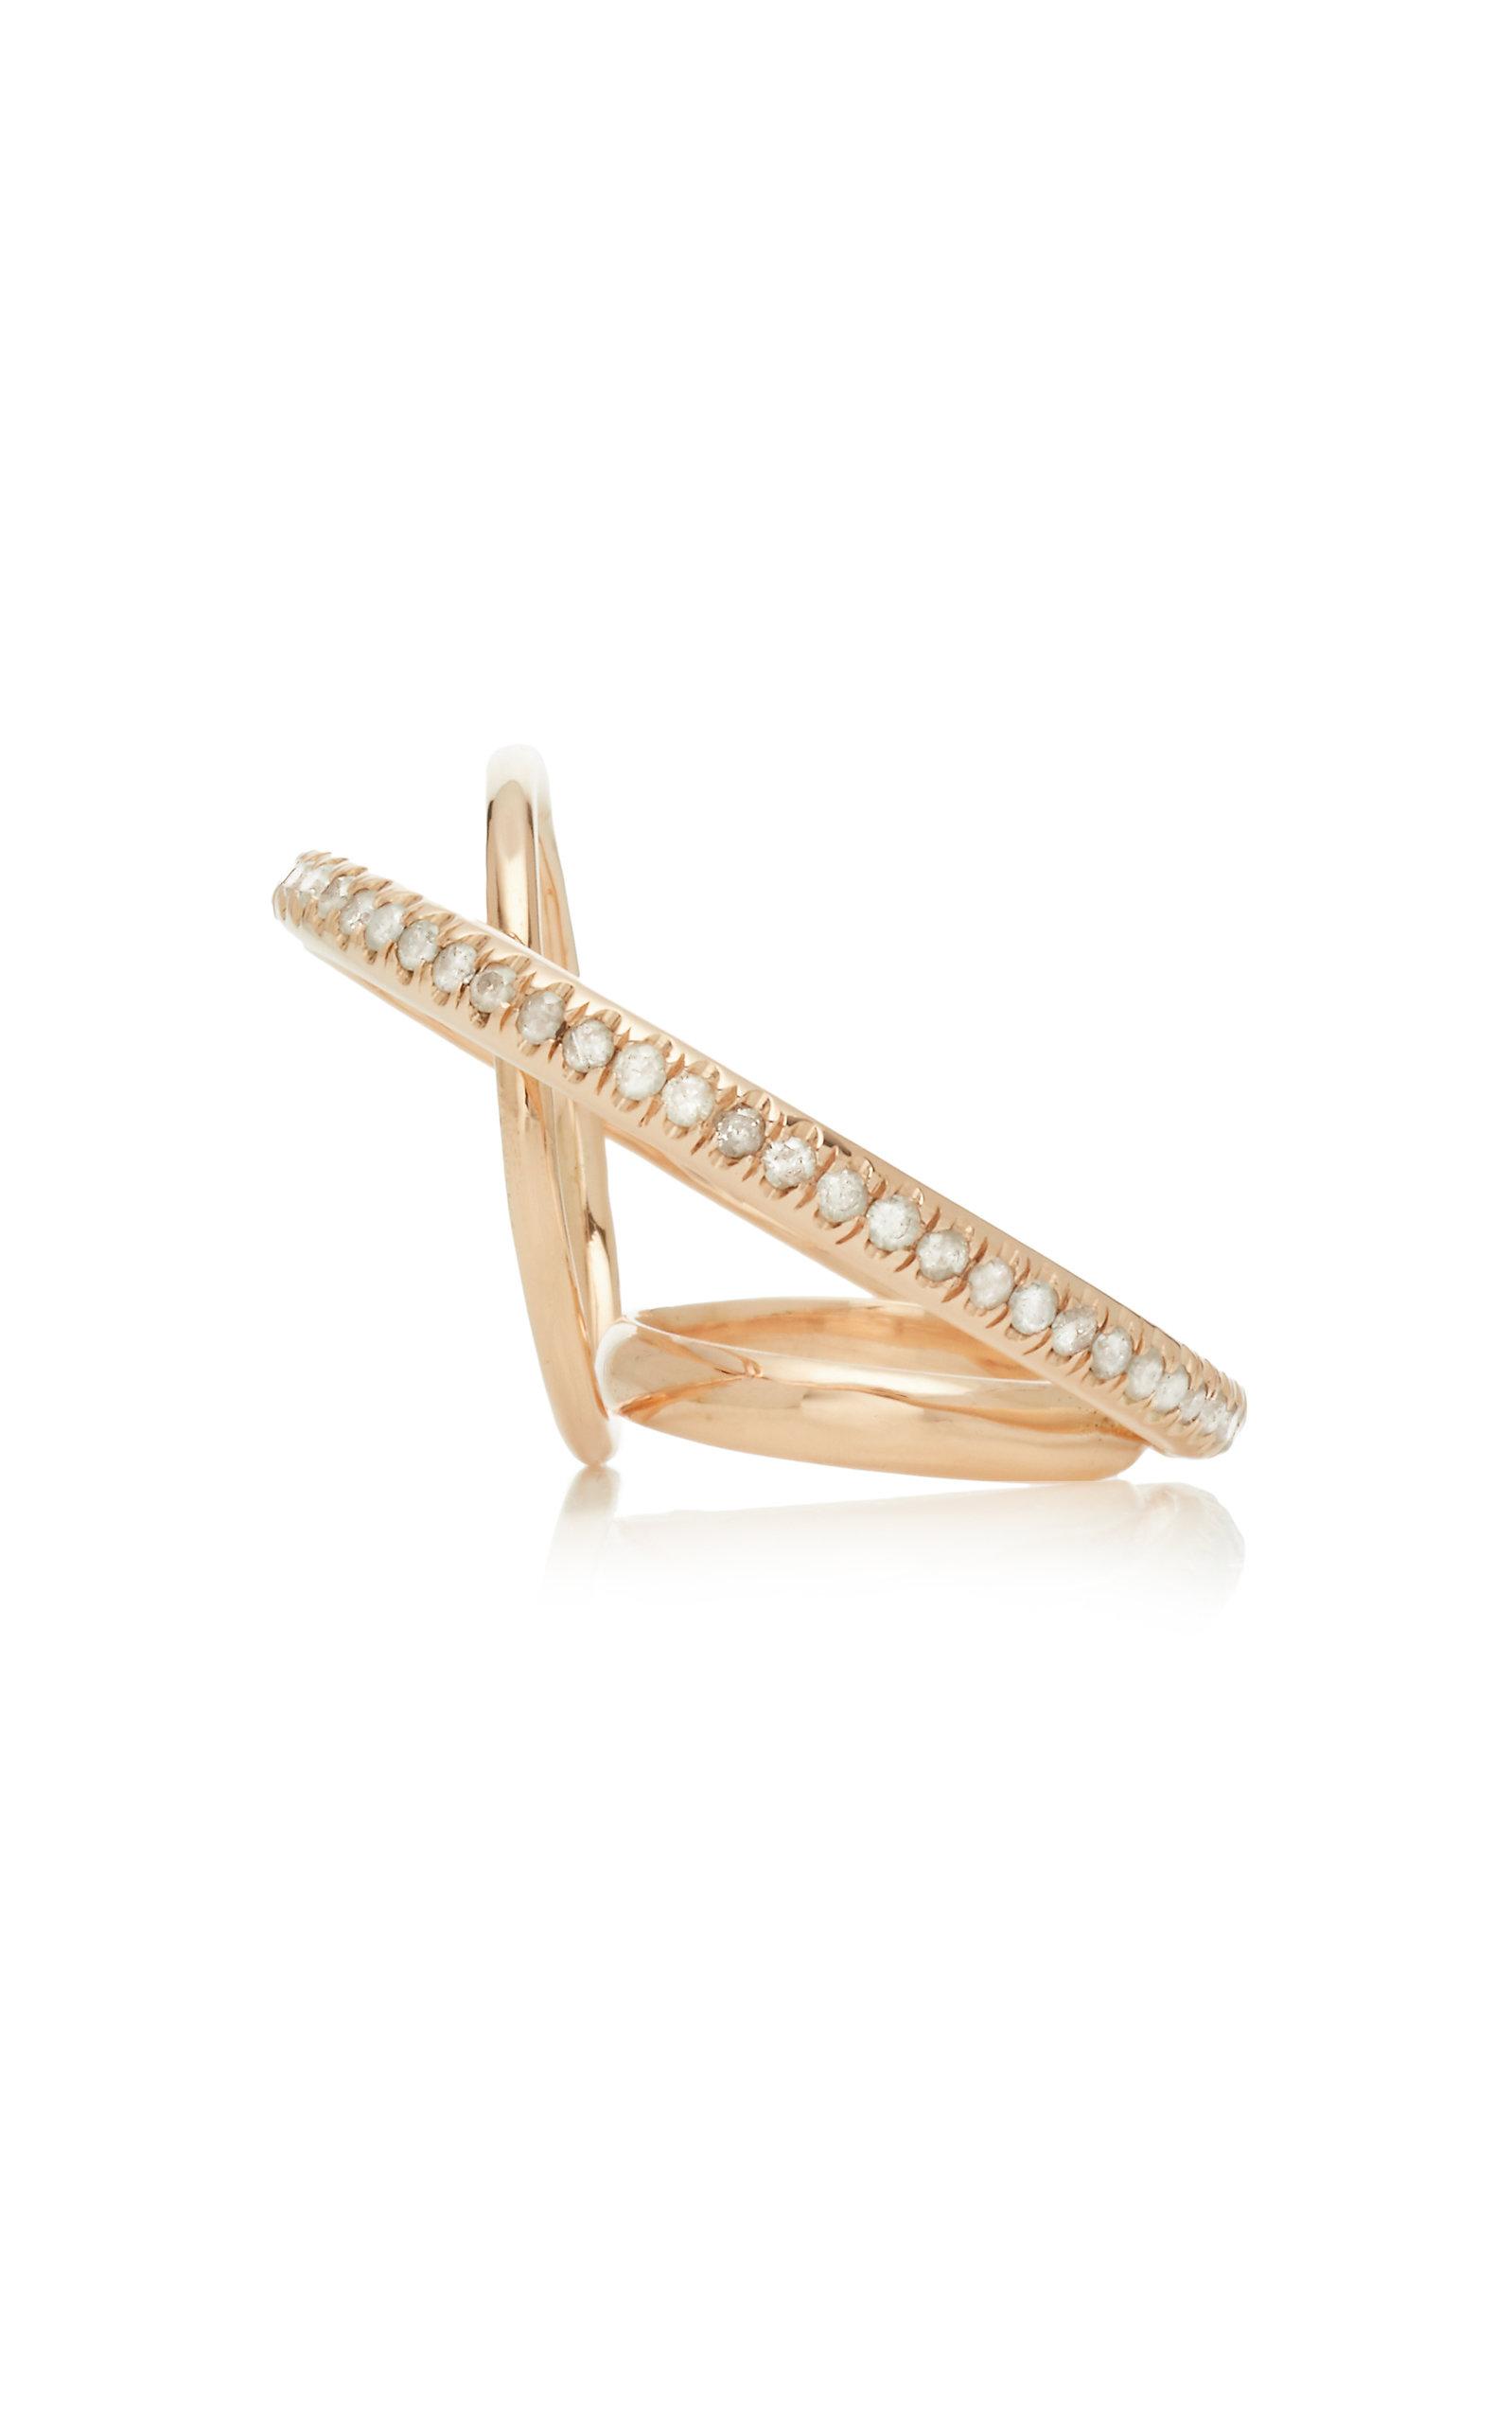 GAELLE KHOURI Dianoia 9K Gold And Diamond Pinkie Ring